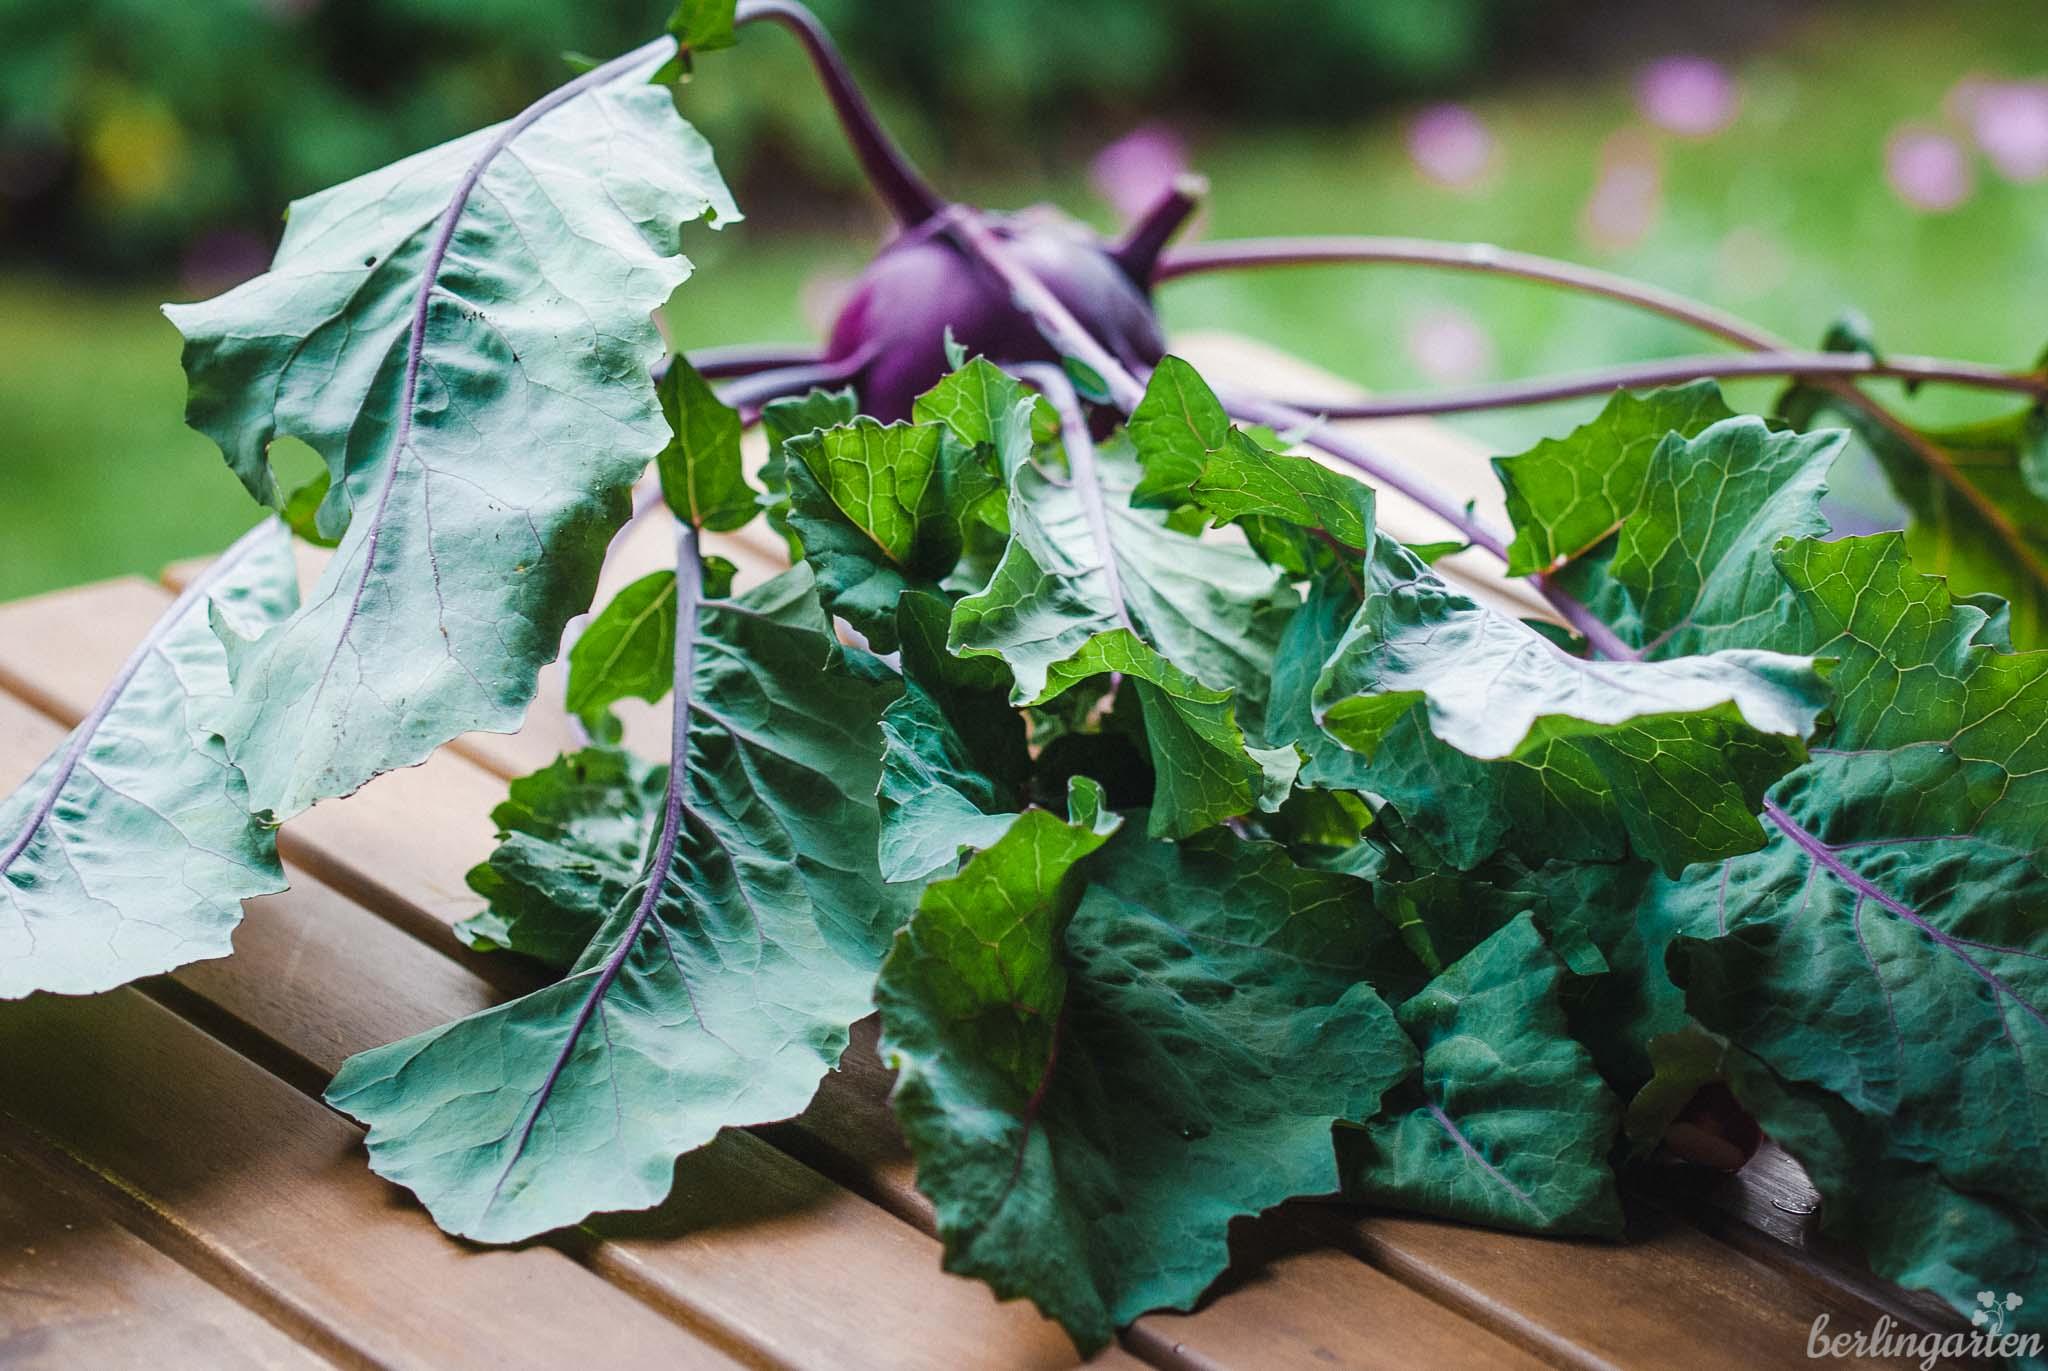 Kohlrabi-Blätter kann man essen